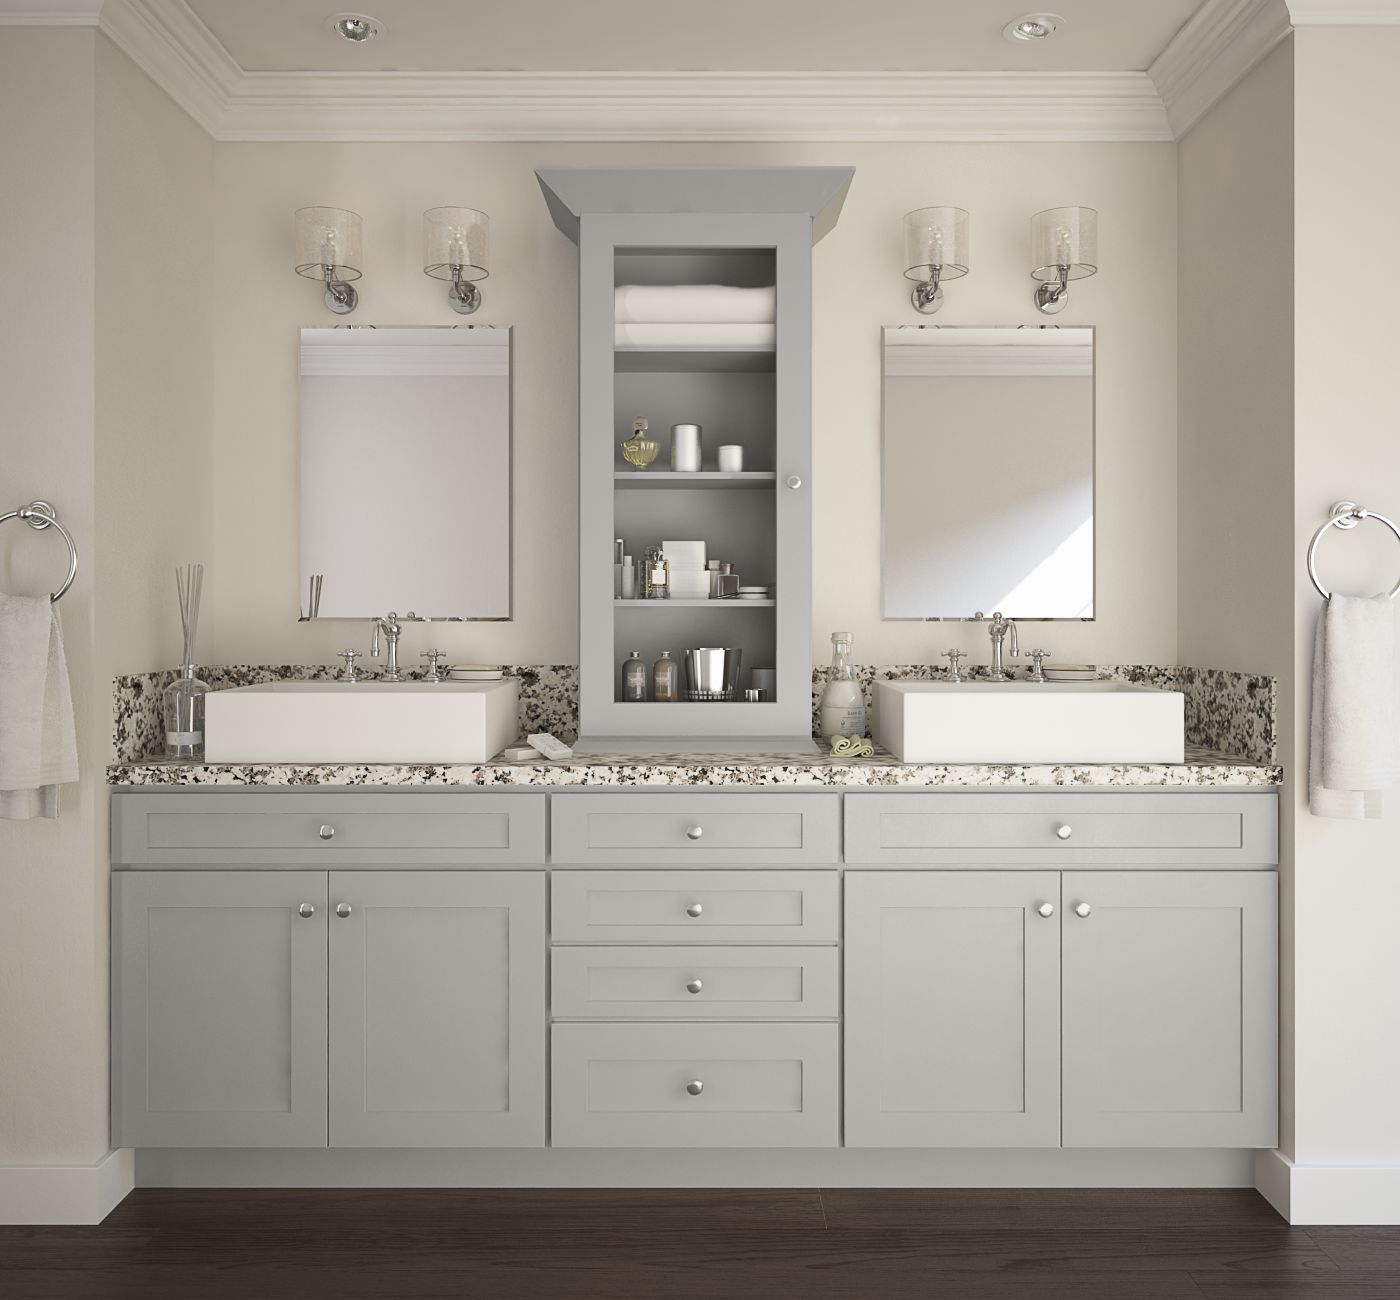 Society Shaker Dove Gray Pre-Assembled Bathroom Vanities ...